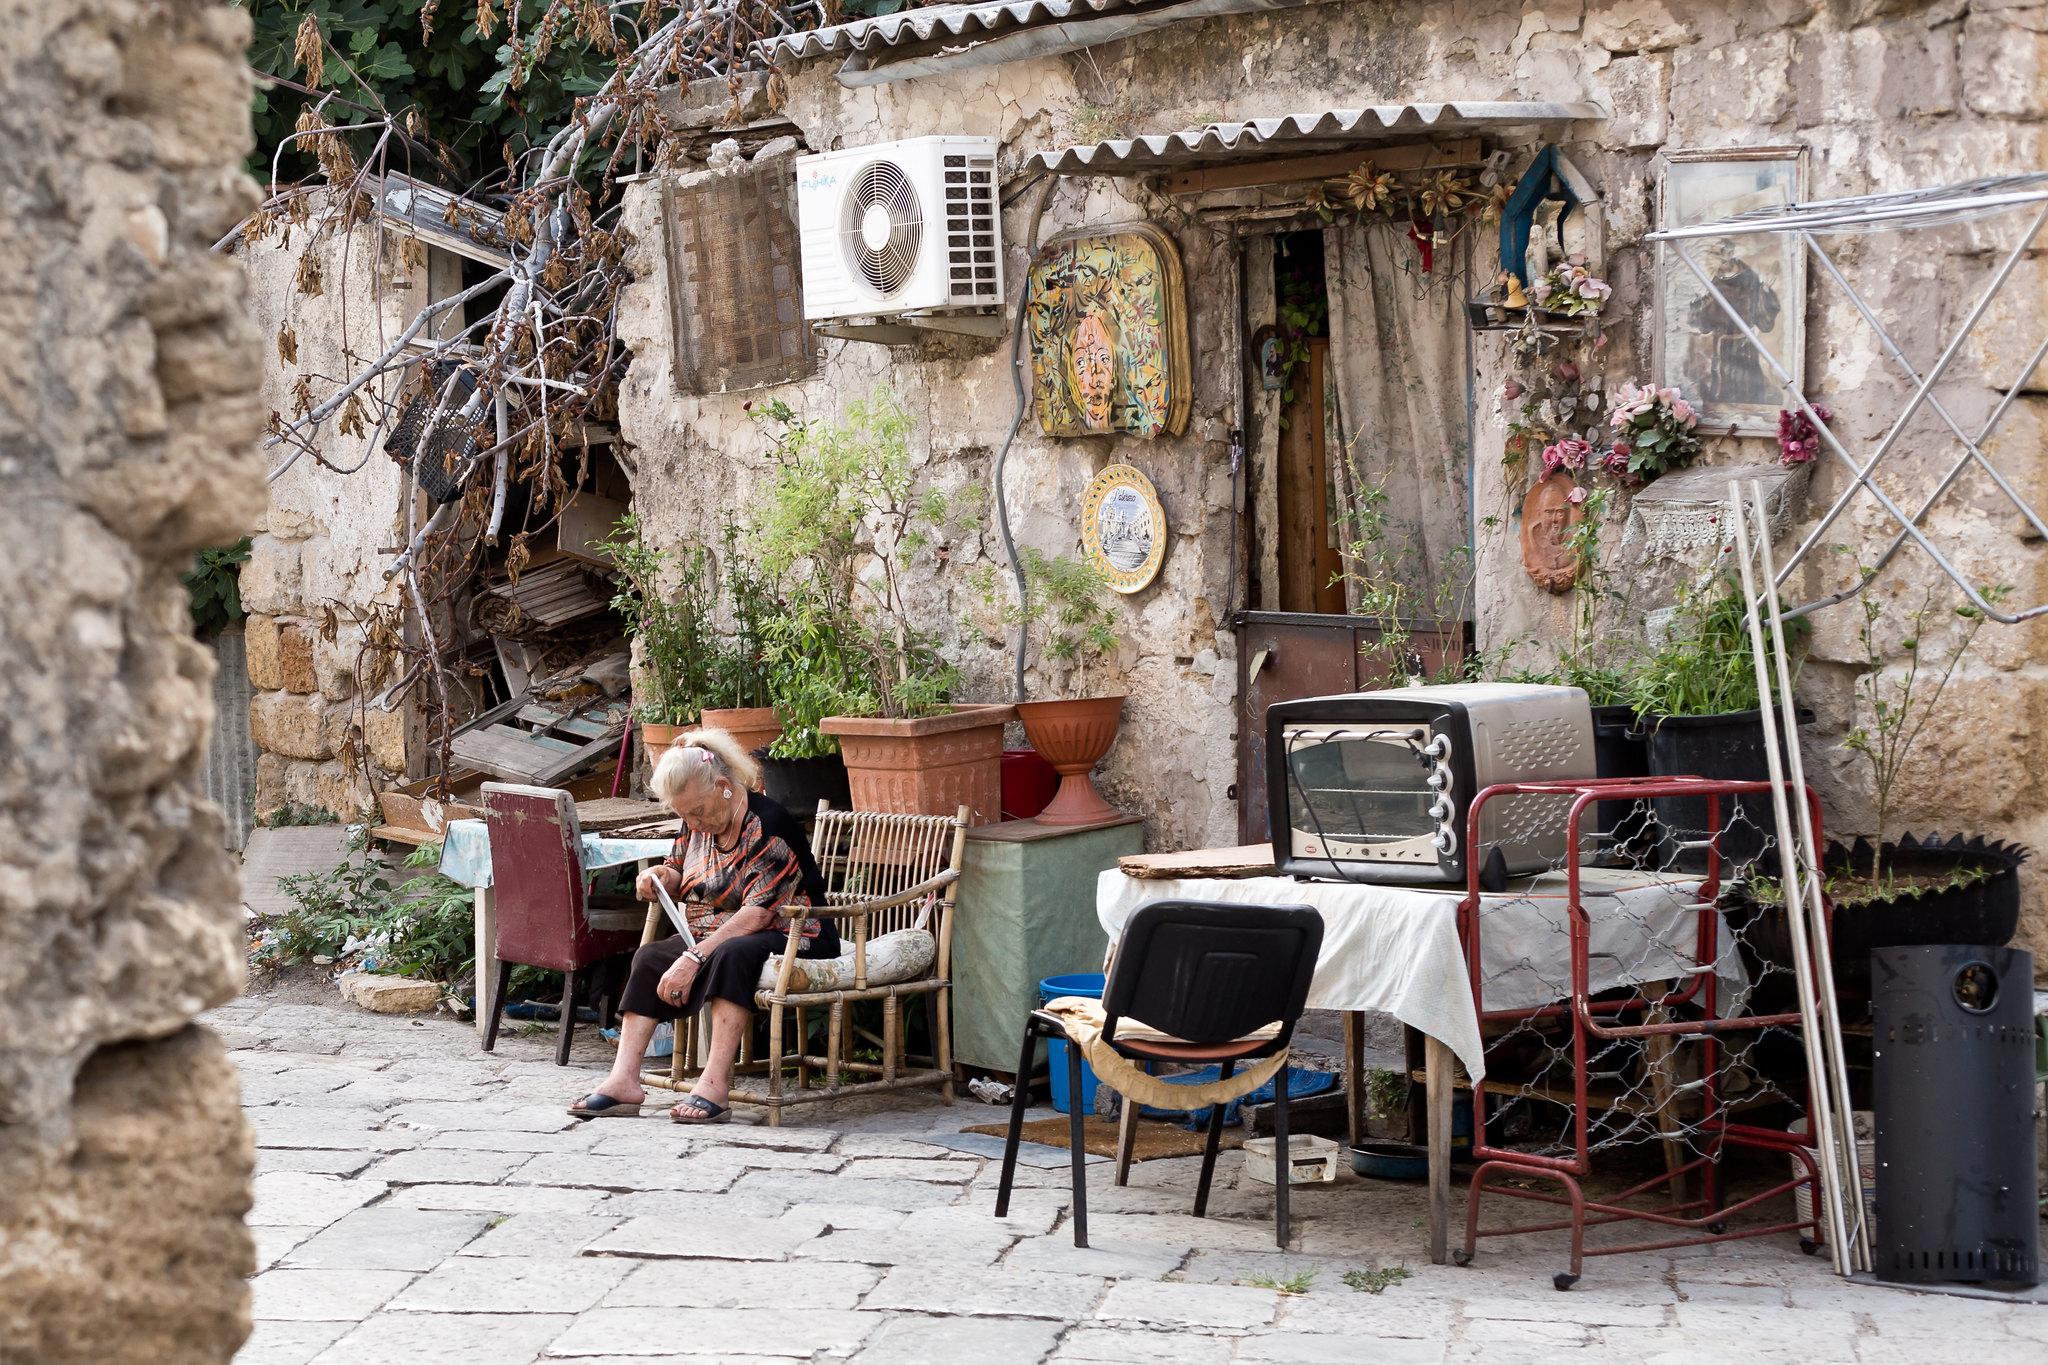 Via Judica, Palermo